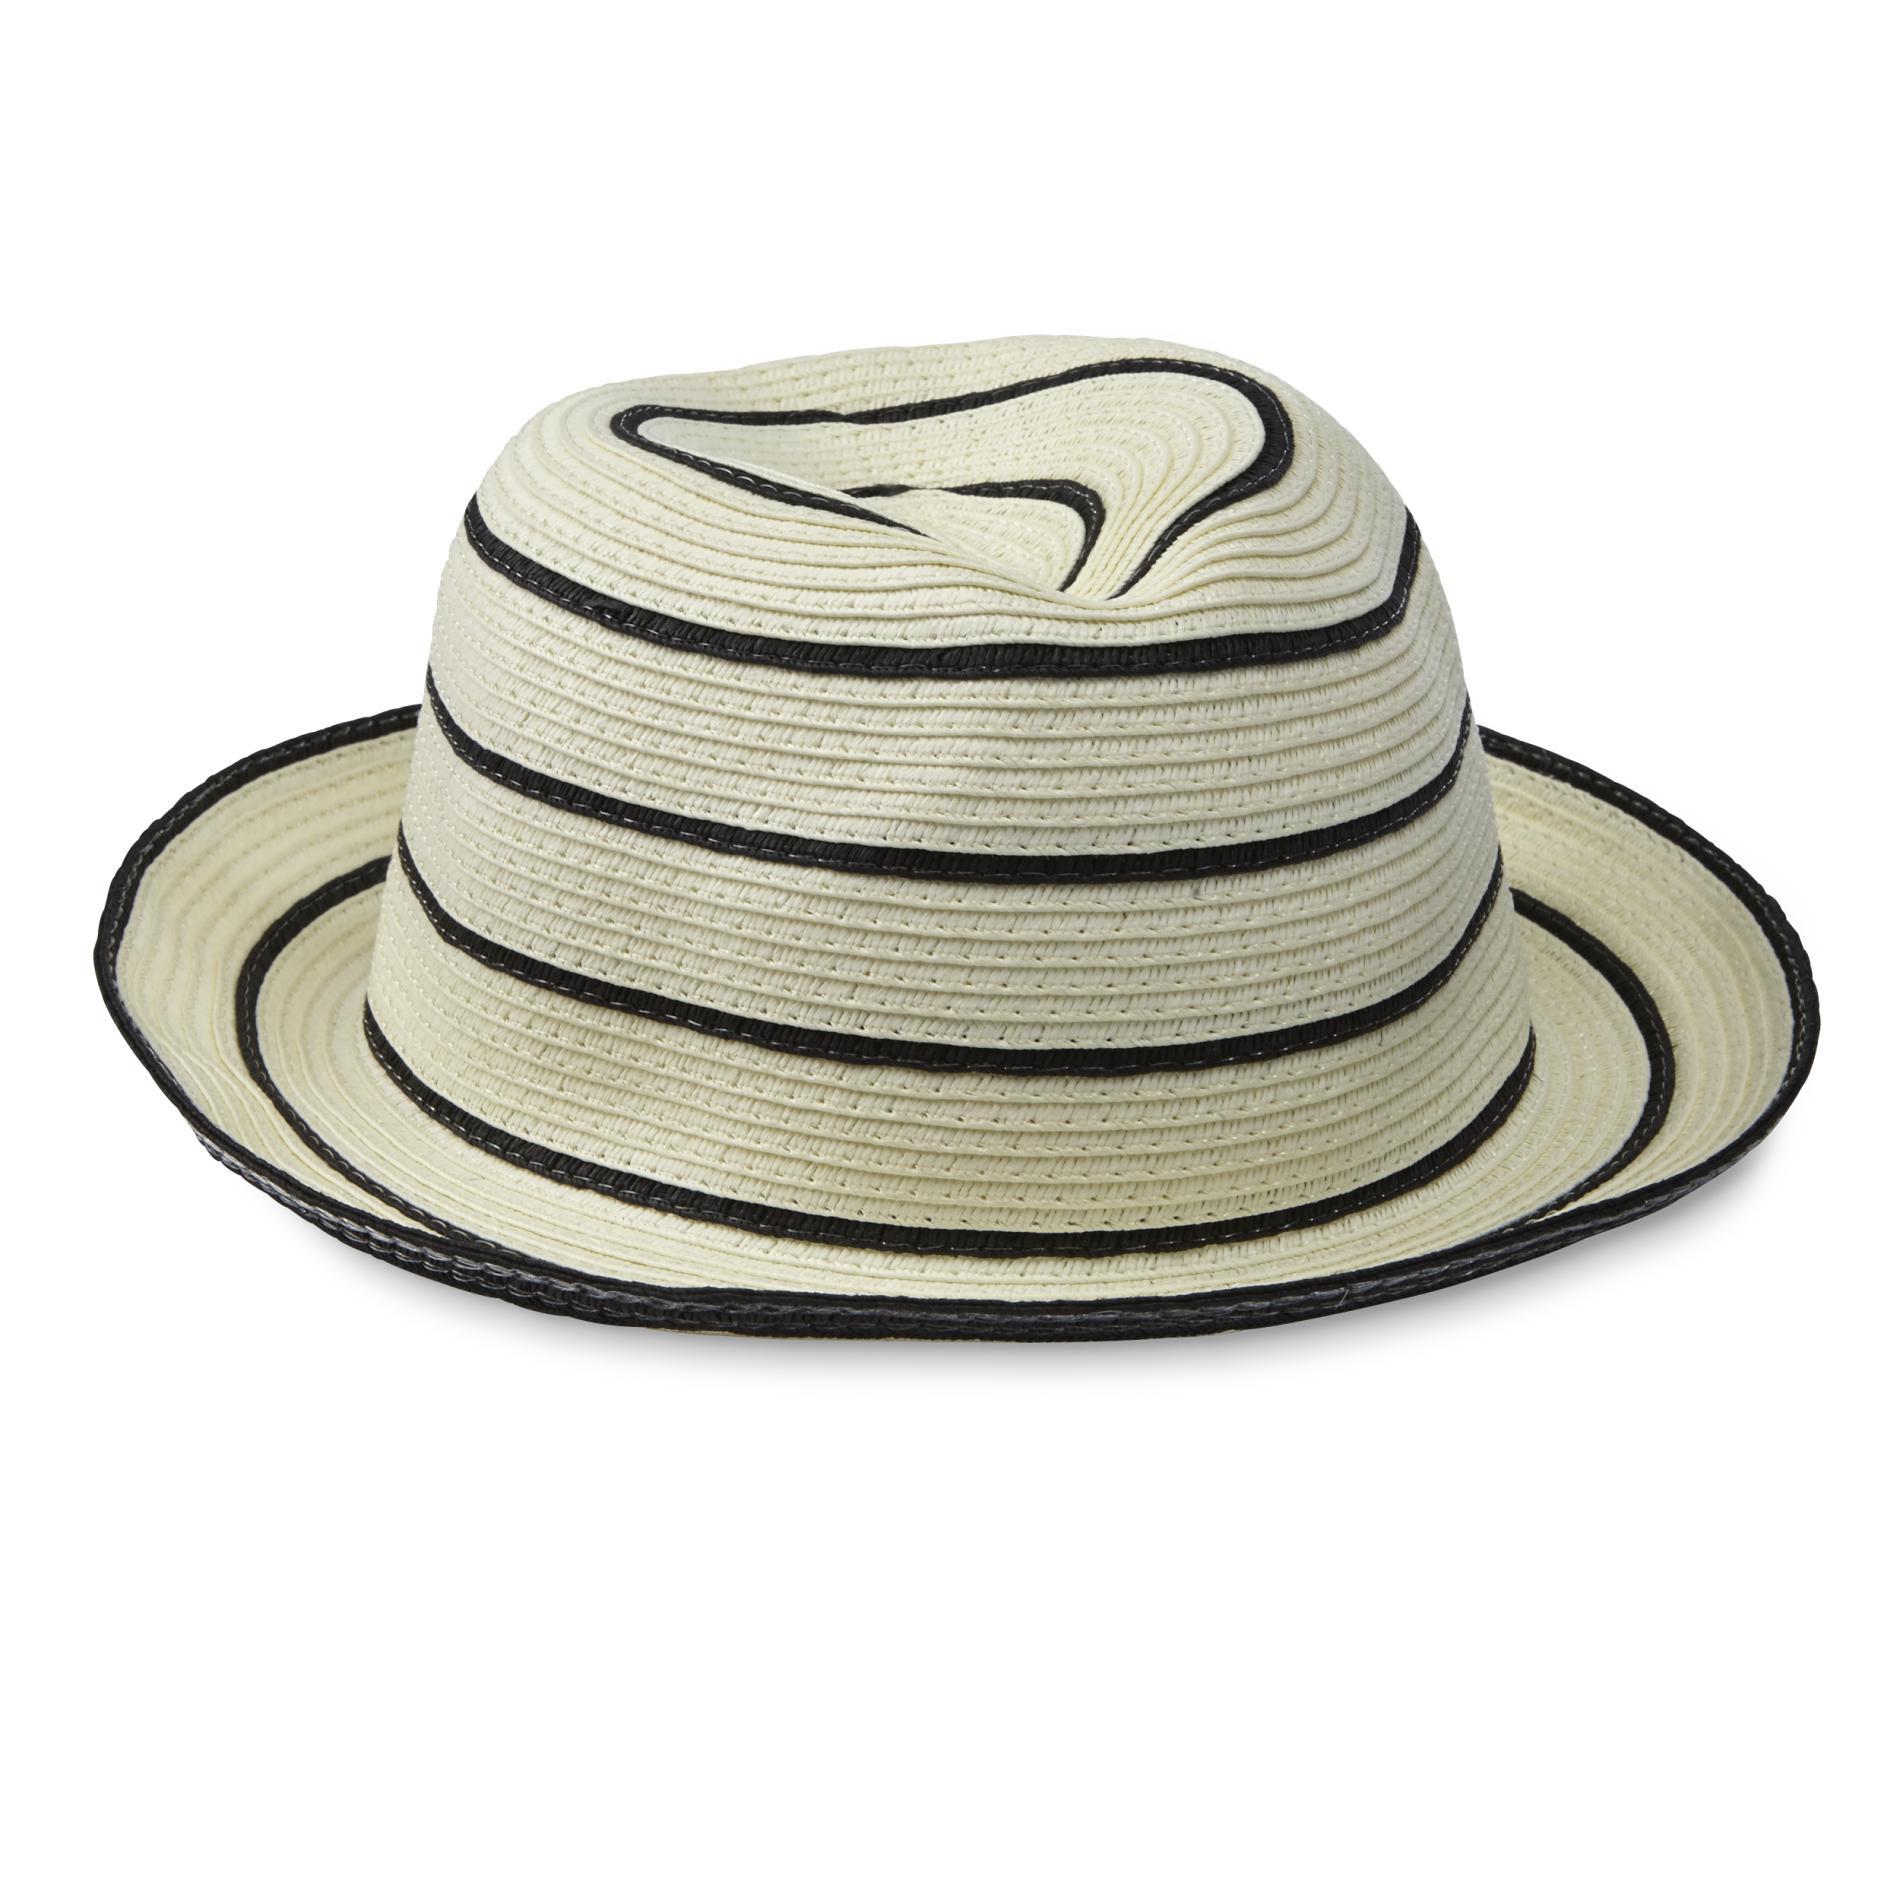 Women's Cream/Black Straw Fedora Hat